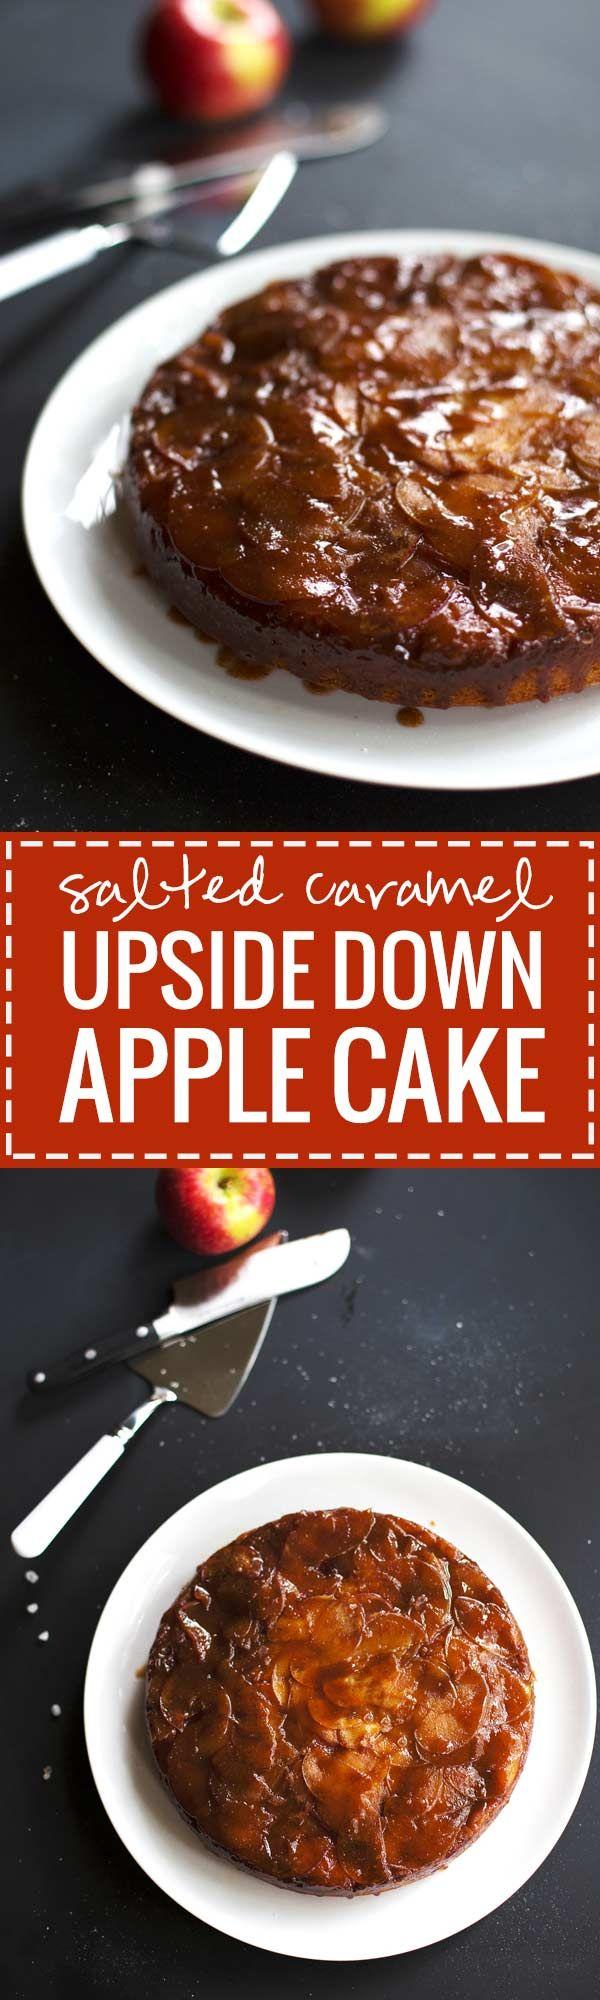 Salted Caramel Upside Down Apple Cake | pinchofyum.com